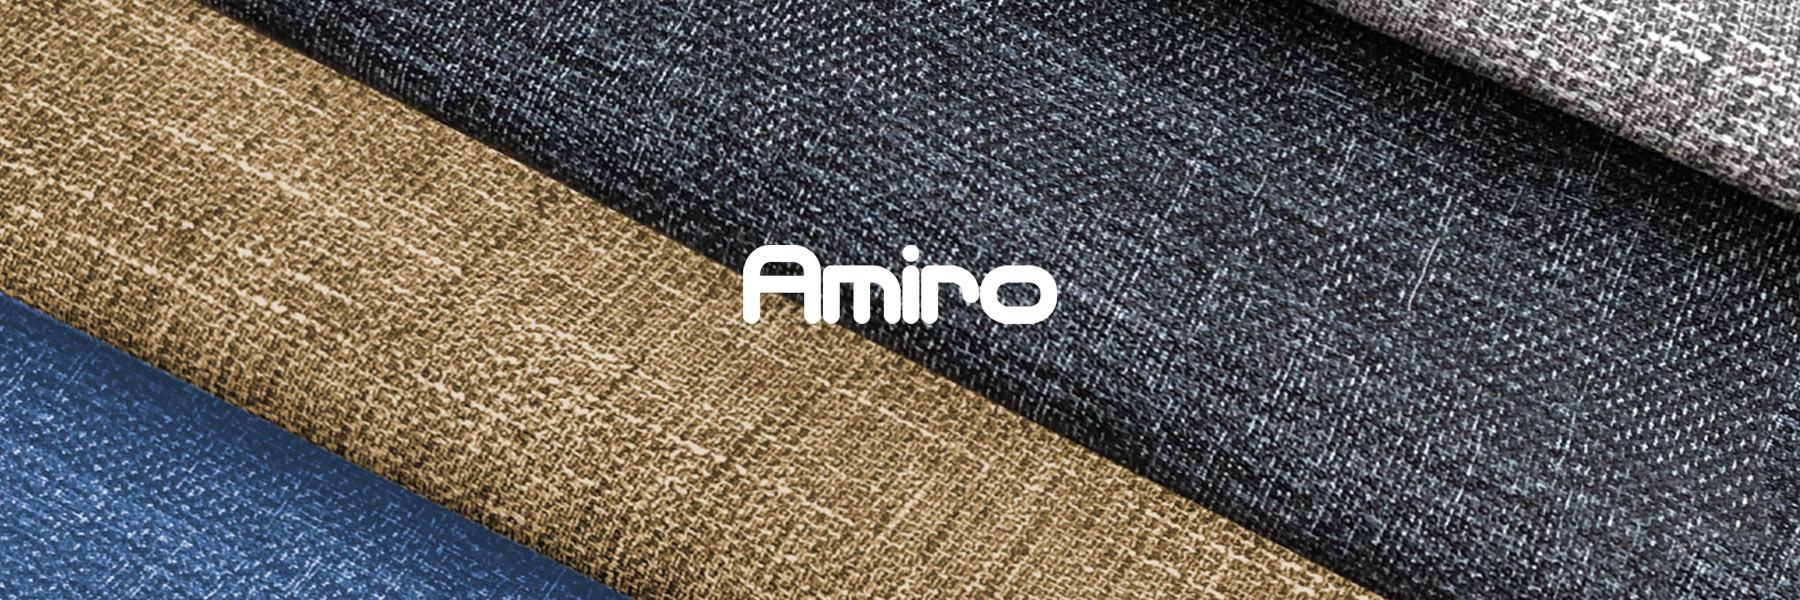 AD2 Amiro header